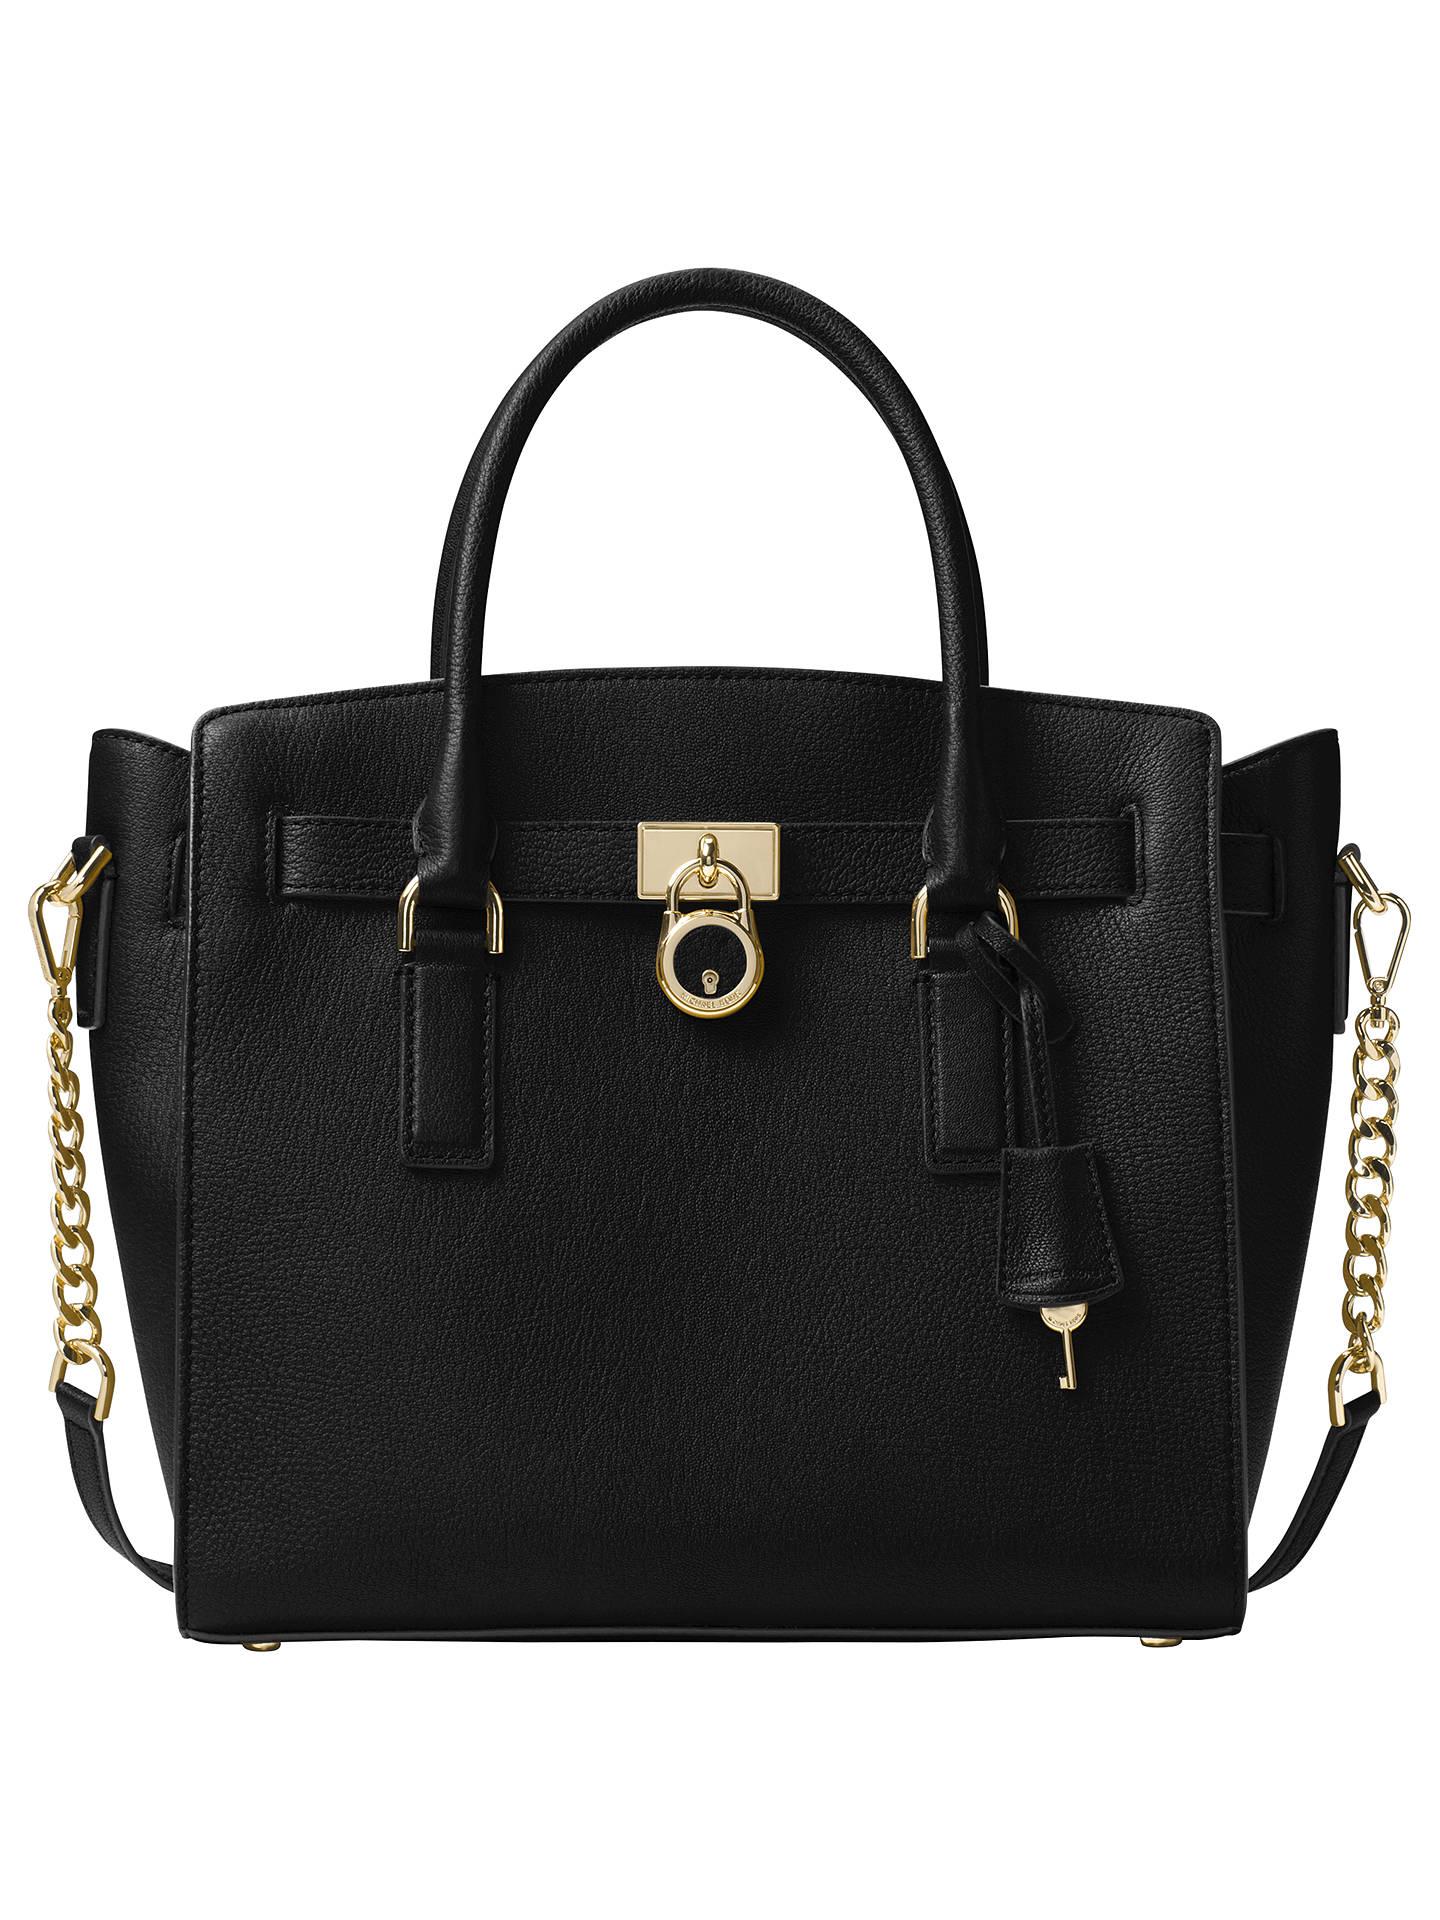 6df23b2b9b63ca Buy MICHAEL Michael Kors Hamilton Leather Large East/West Tote Bag, Black  Online at ...